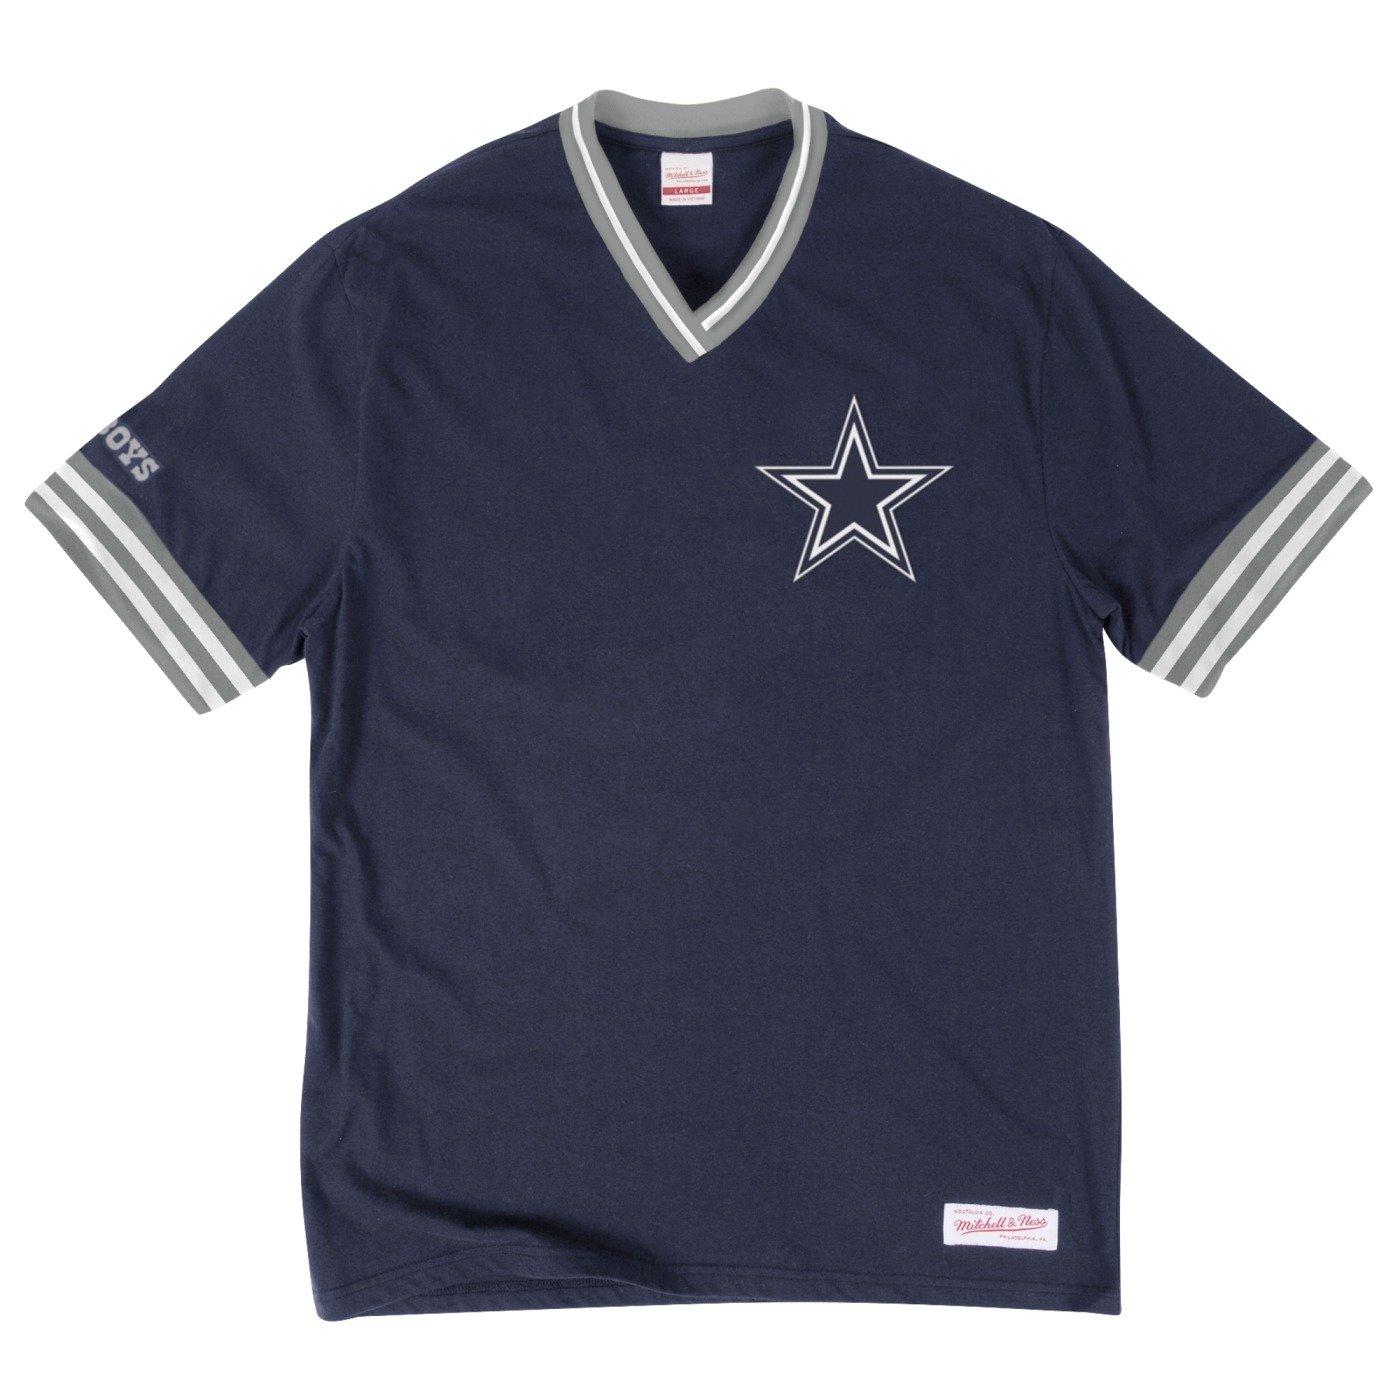 Amazon.com   Dallas Cowboys NFL Men s Overtime Win Vintage V-Neck T-Shirt  (Medium)   Sports   Outdoors 16e002457